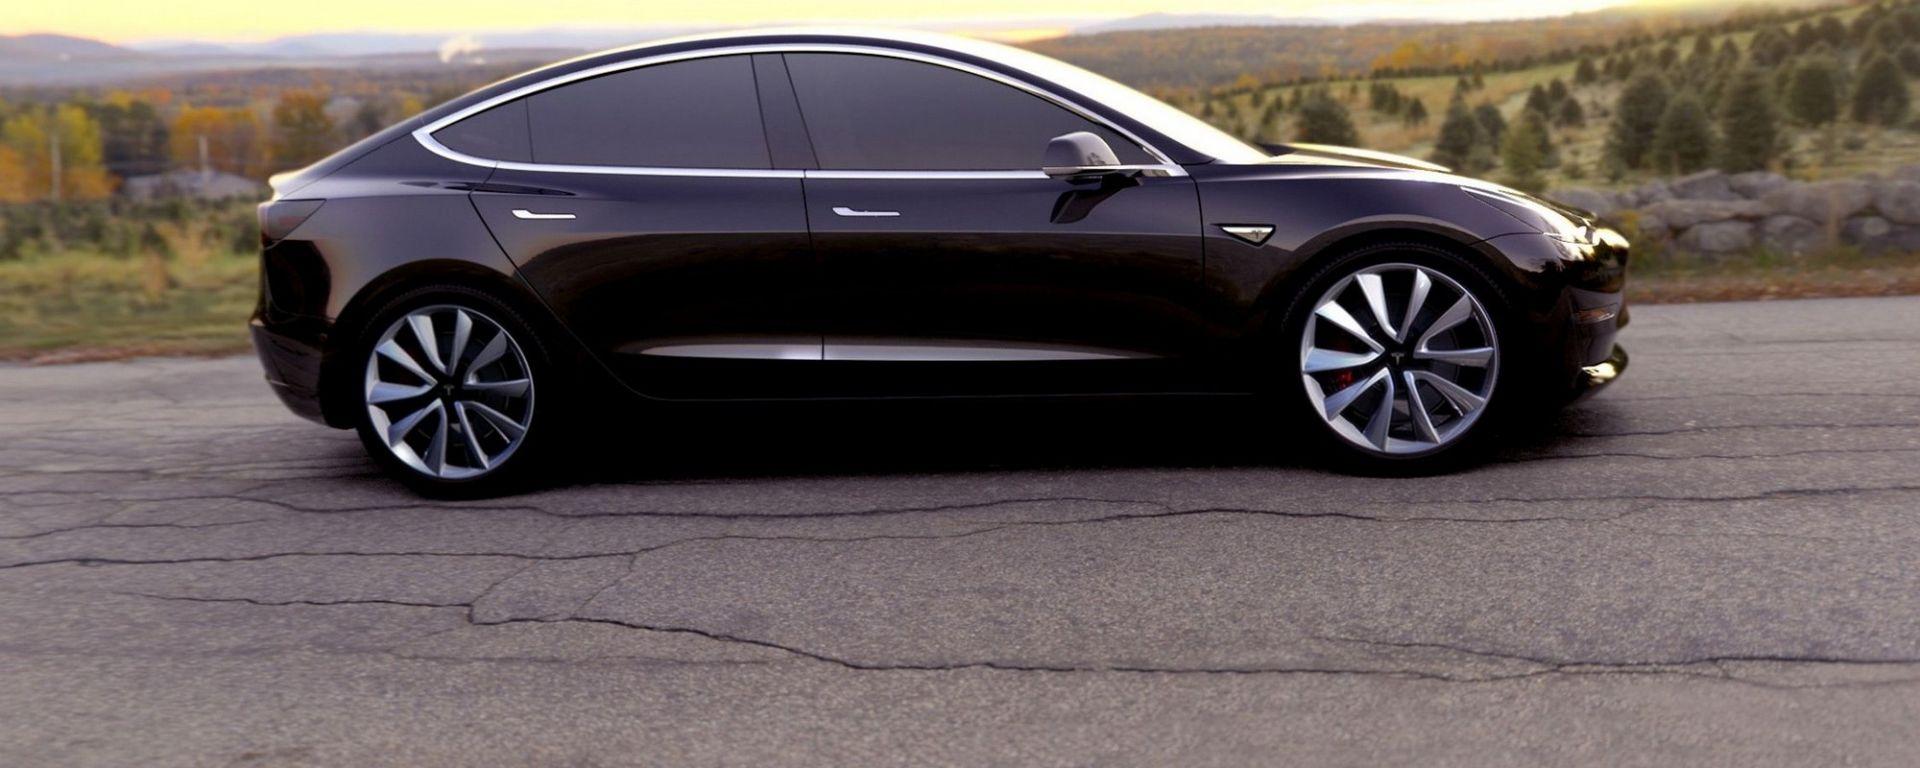 Tesla Model 3, una piantagrane?